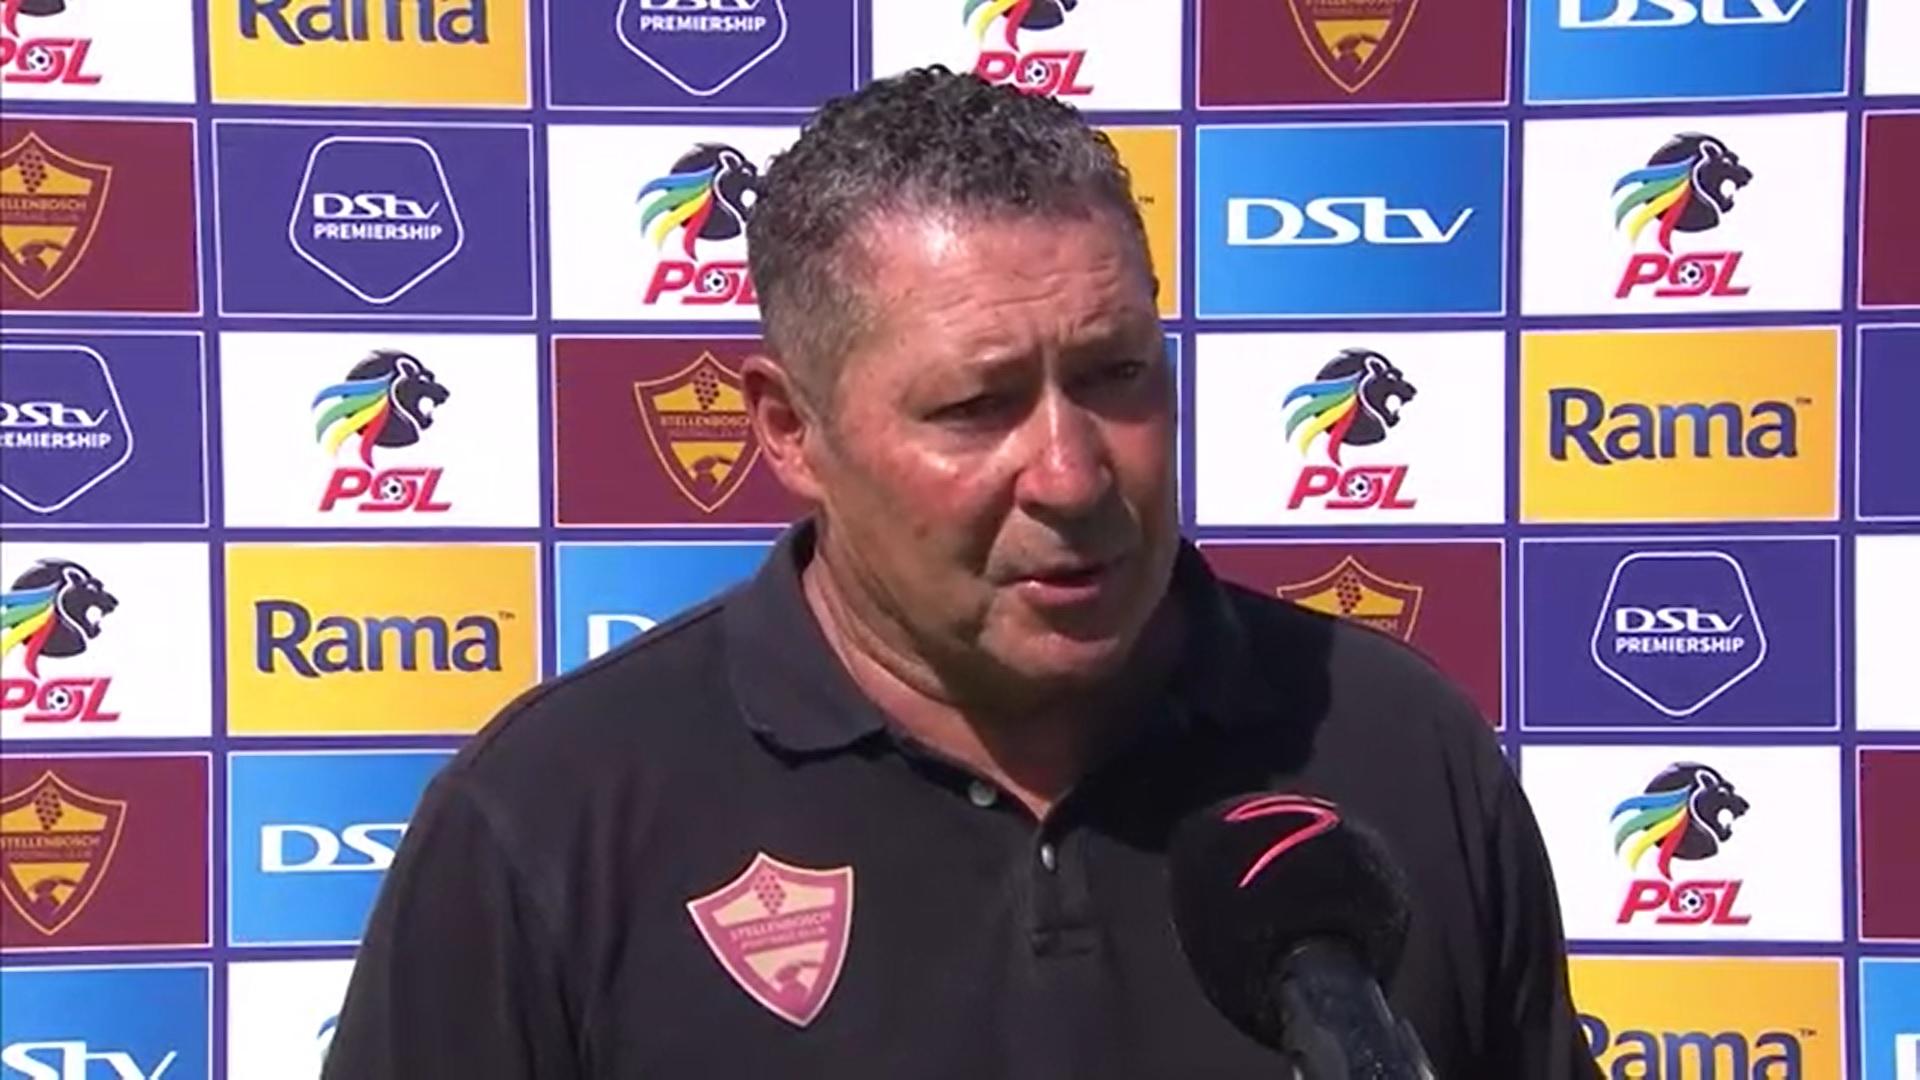 DStv Premiership | Stellenbosch FC v Mamelodi Sundowns | Post-match interview with Steve Barker